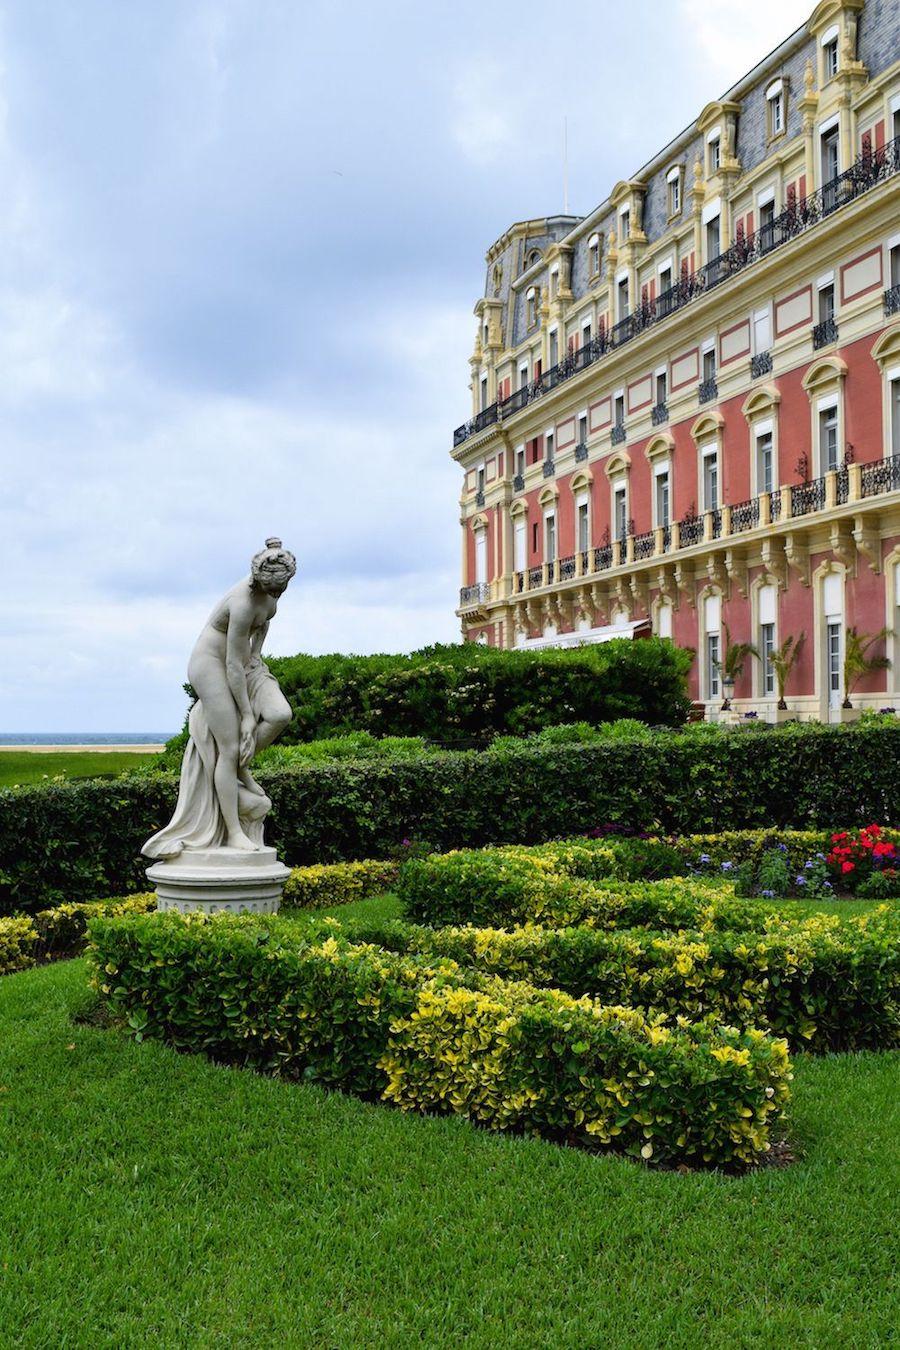 Hotel du Palais